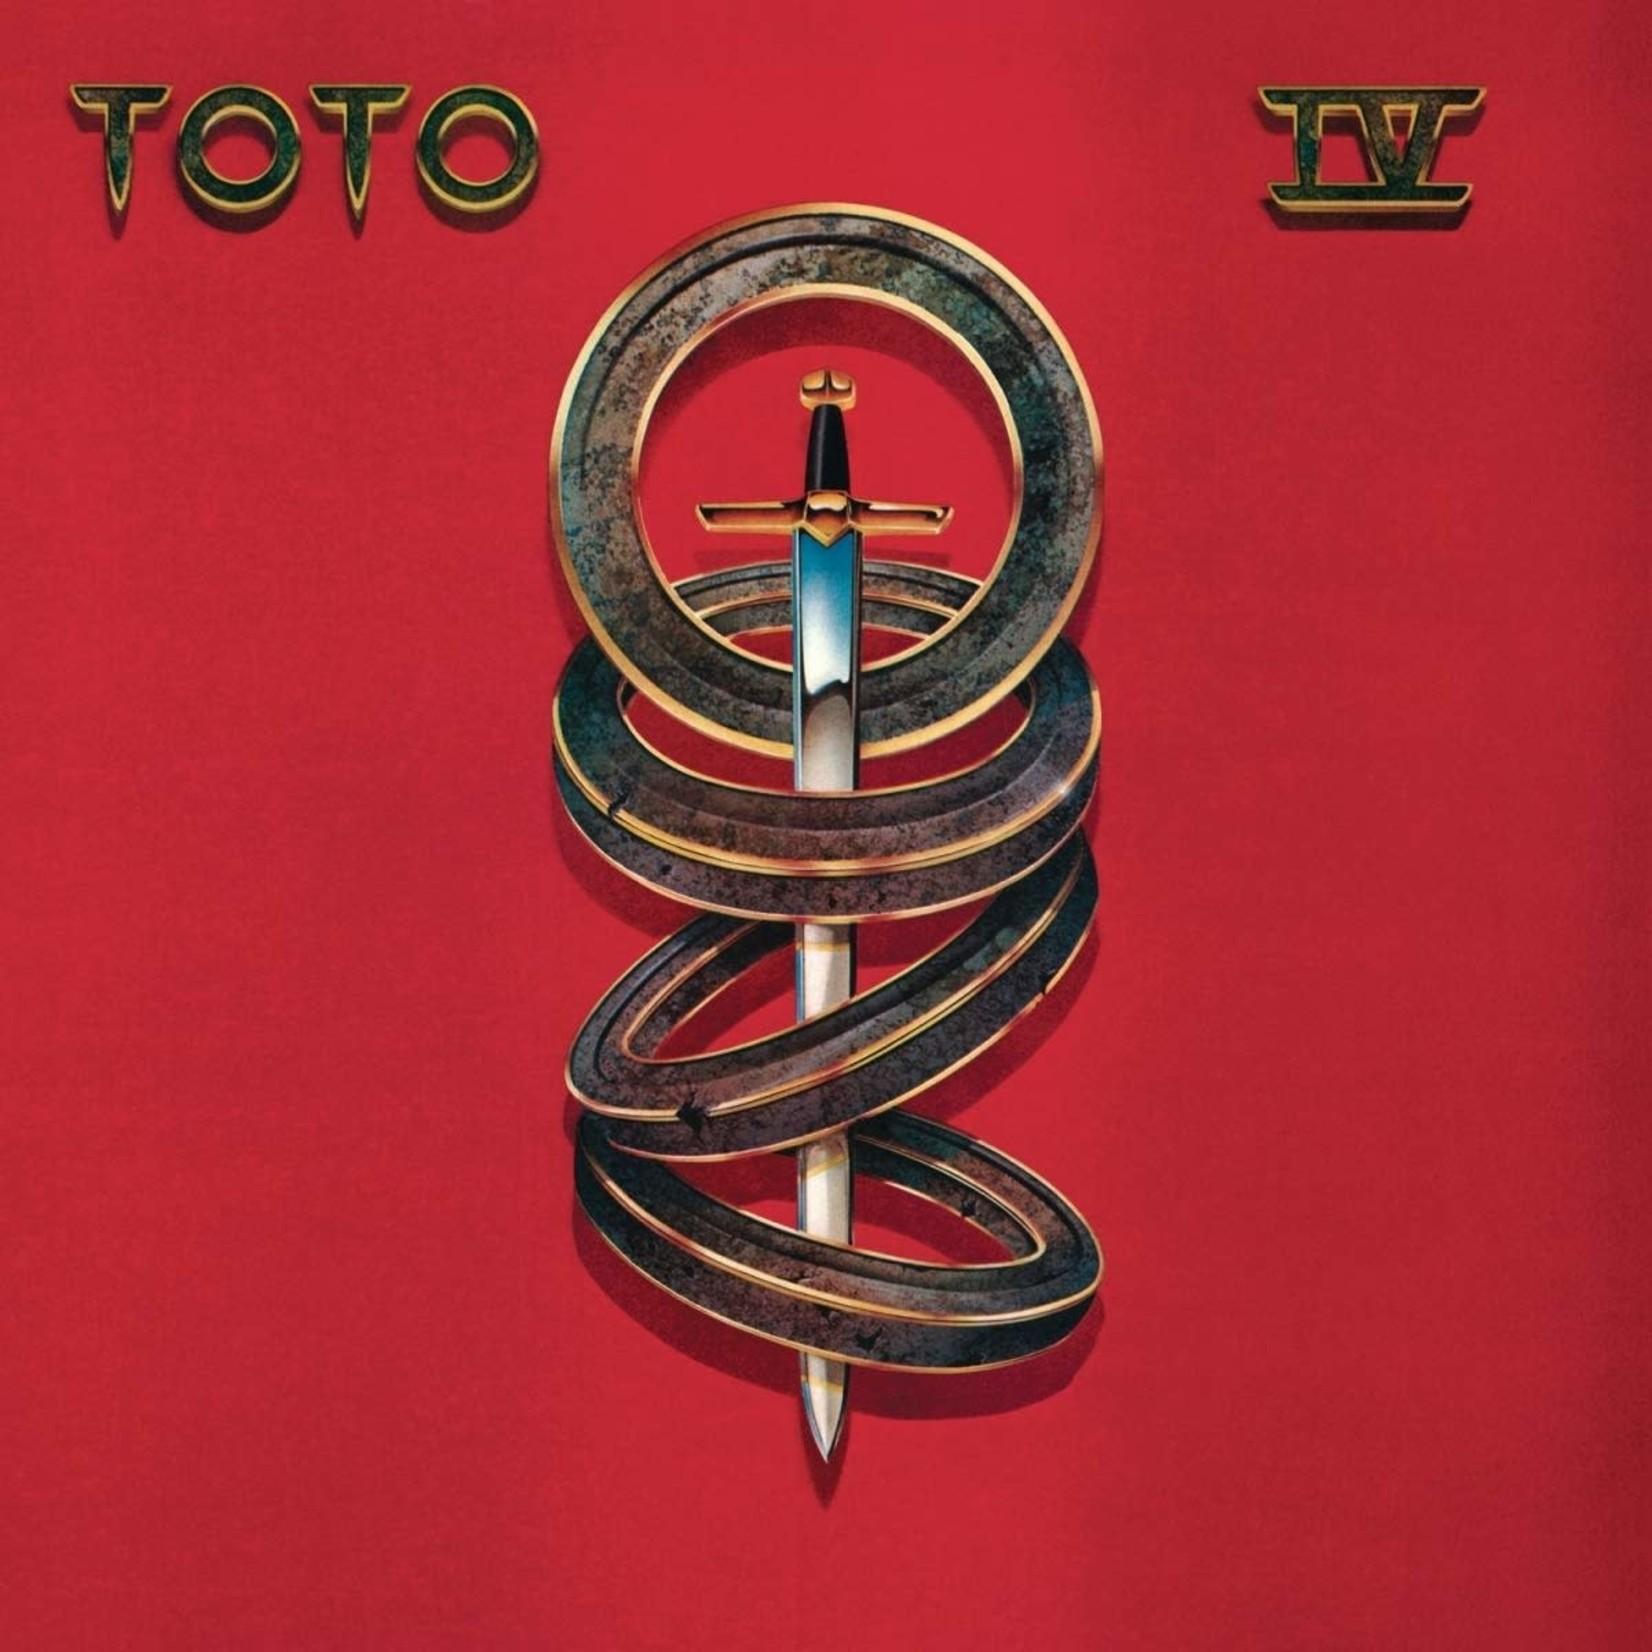 [Vintage] Toto: IV